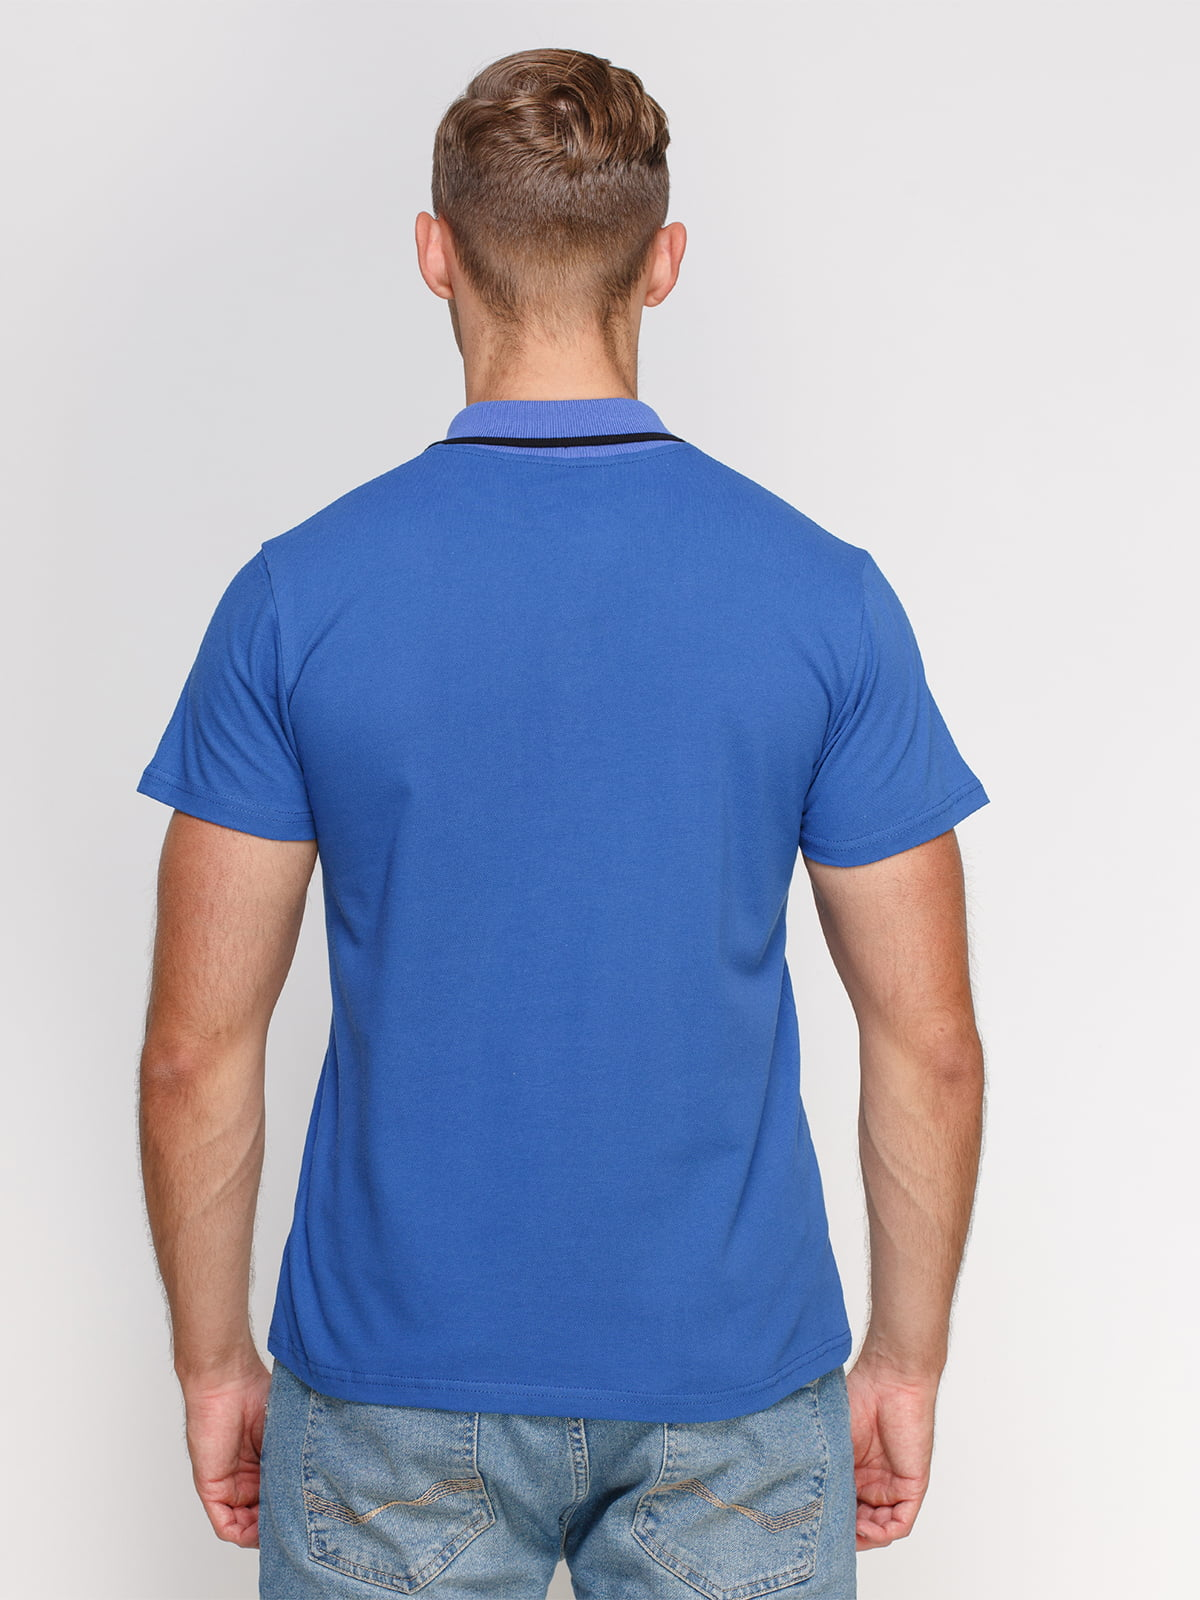 Футболка-поло синя з принтом | 4578505 | фото 2